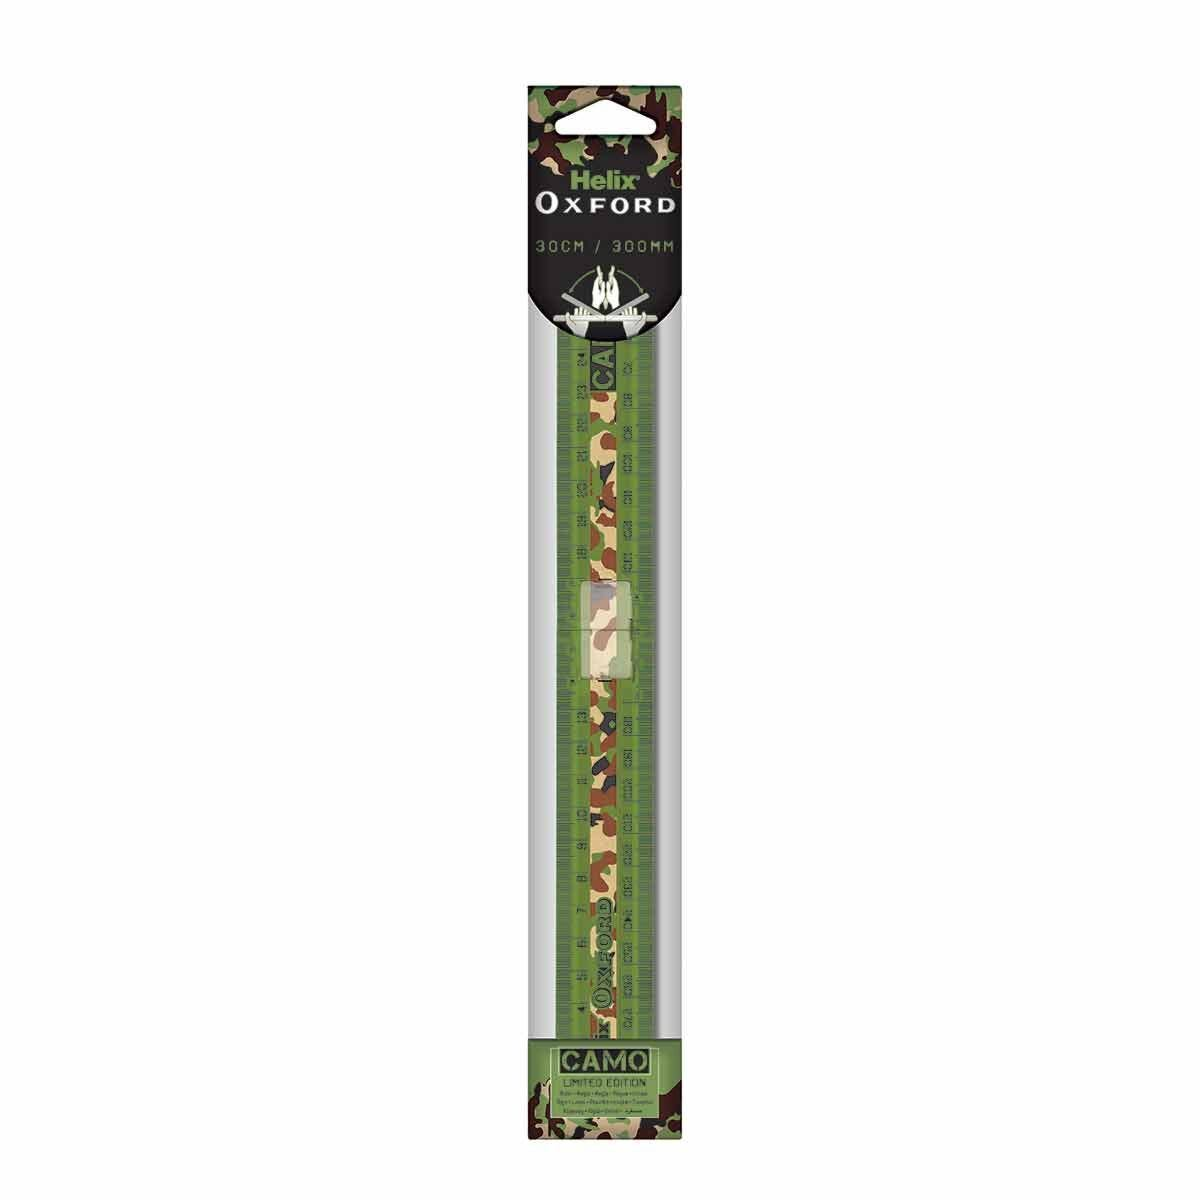 Helix Oxford Camo Folding Ruler Green